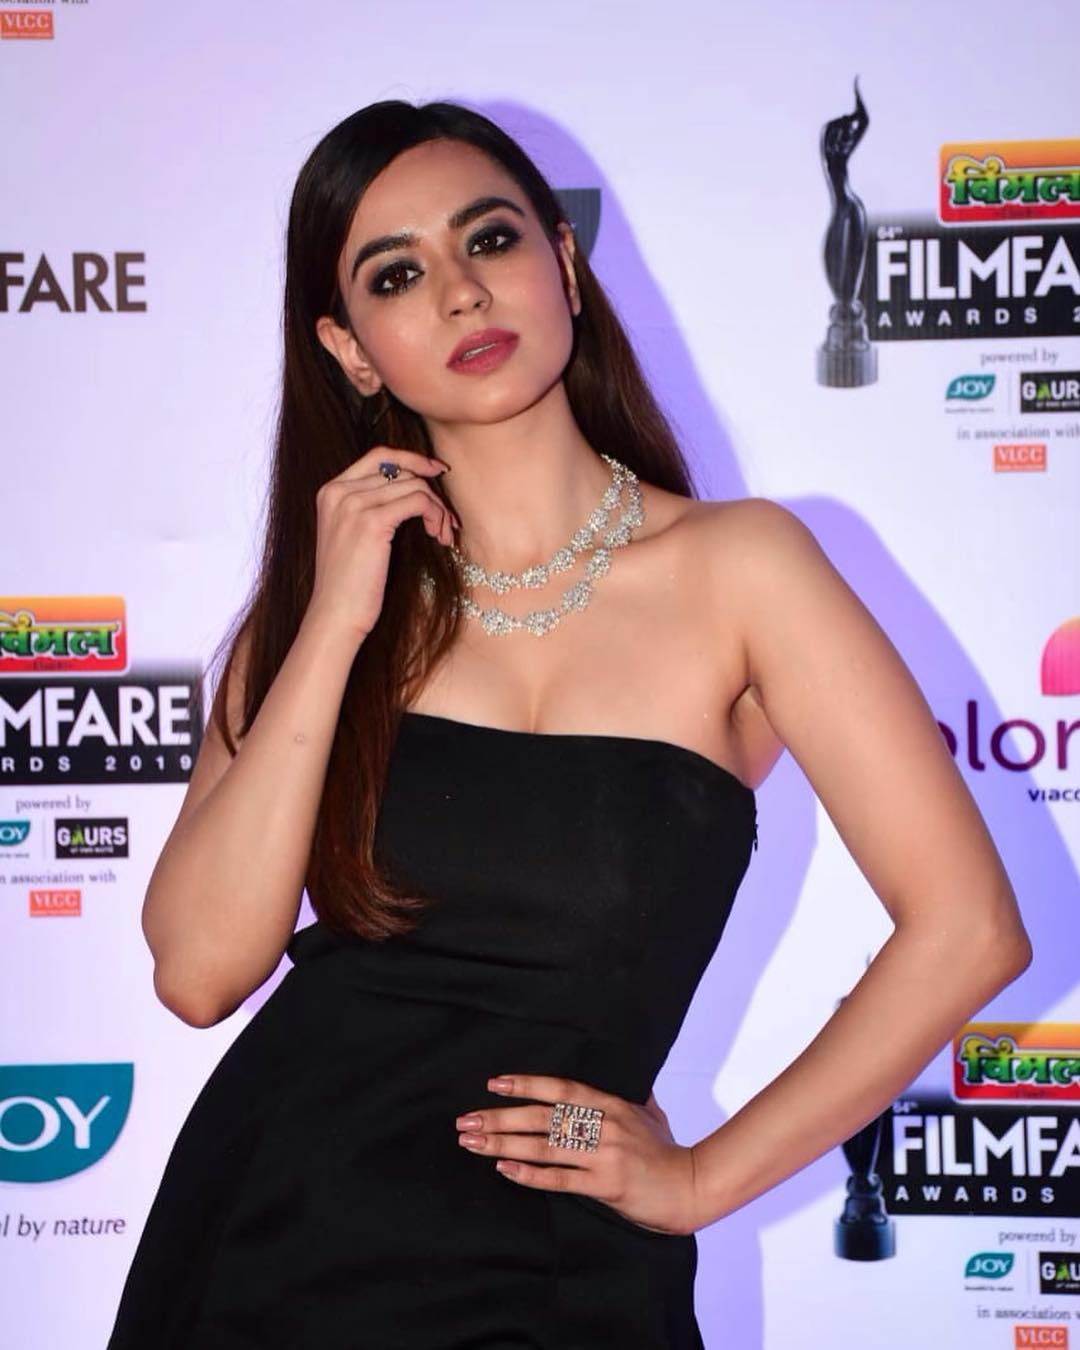 Beauty Queen Soundarya Sharma Photos (6)